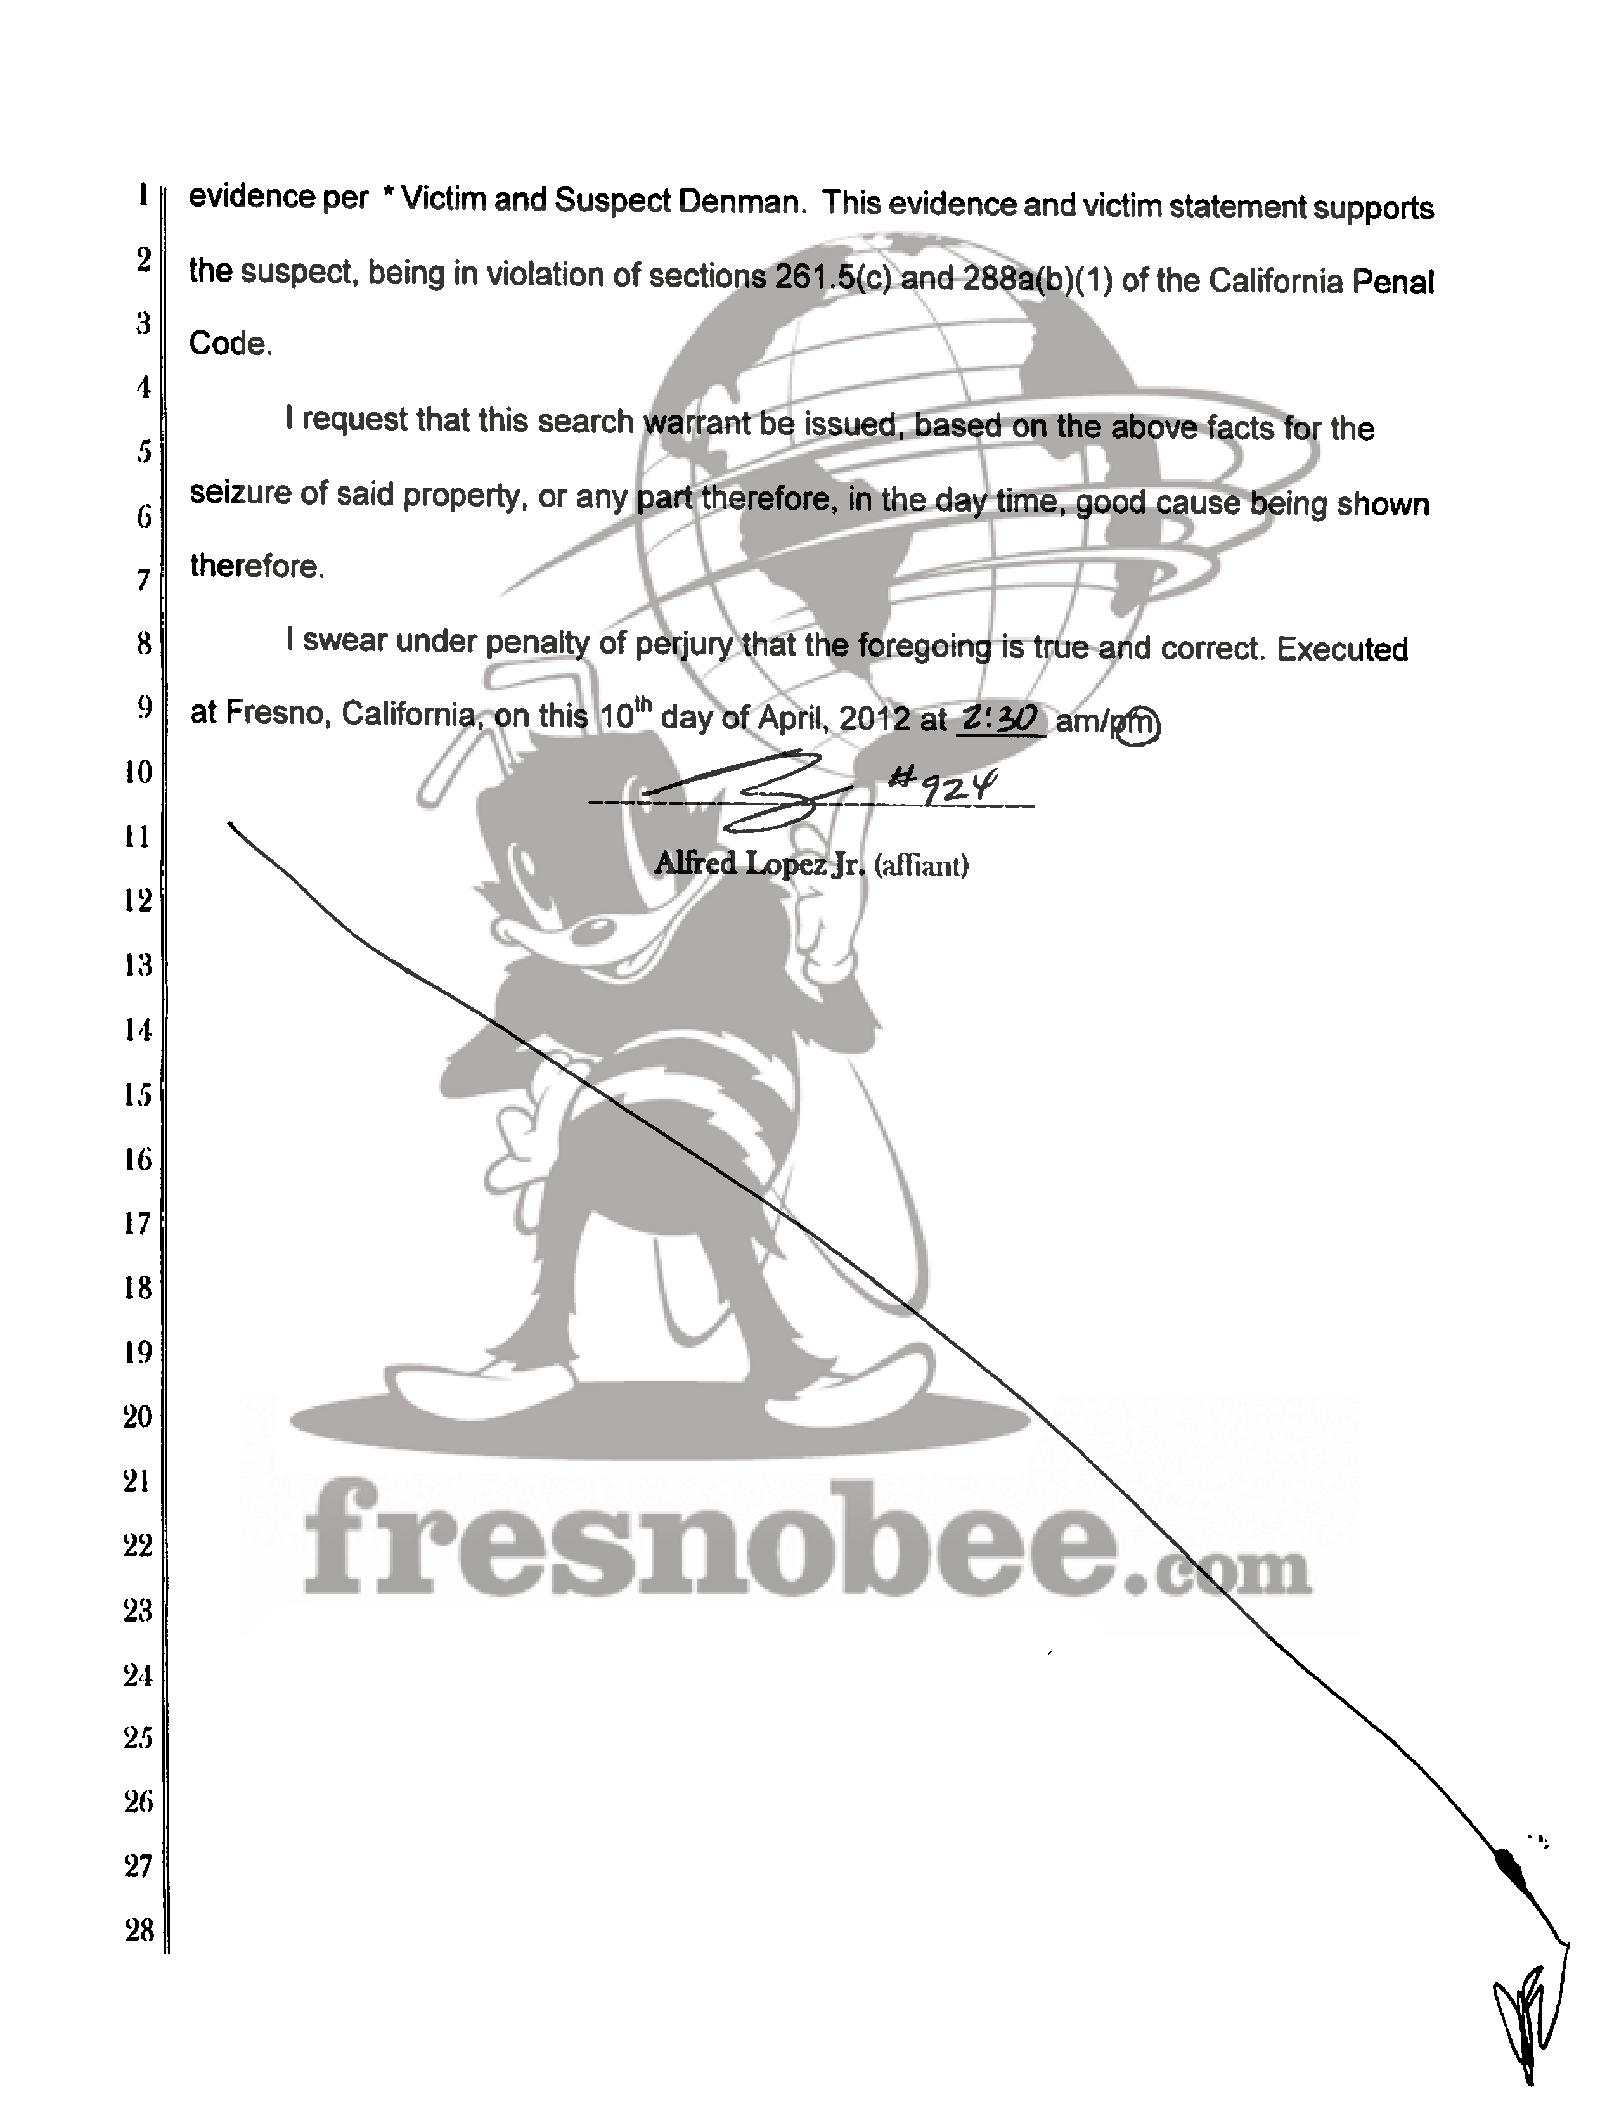 Copy of denman megan search warrant affidavit6.png